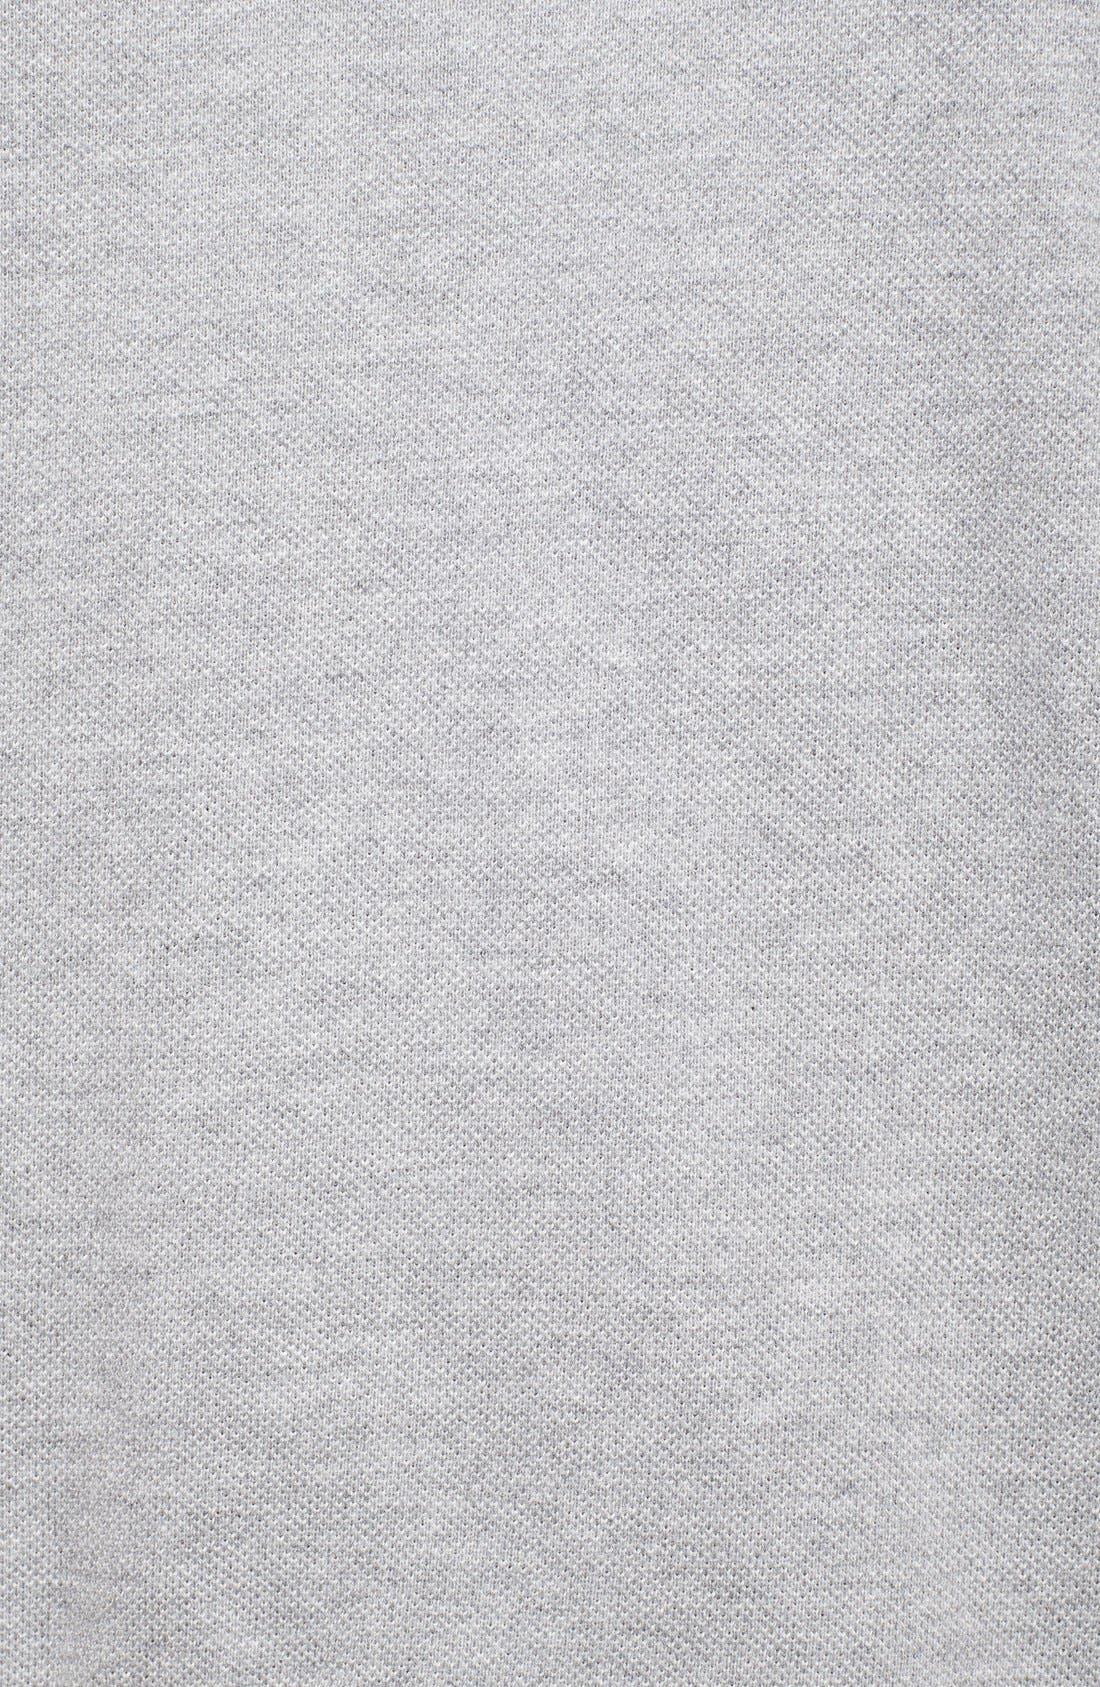 THOM BROWNE, Club Collar Cotton Piqué Polo, Alternate thumbnail 3, color, 020